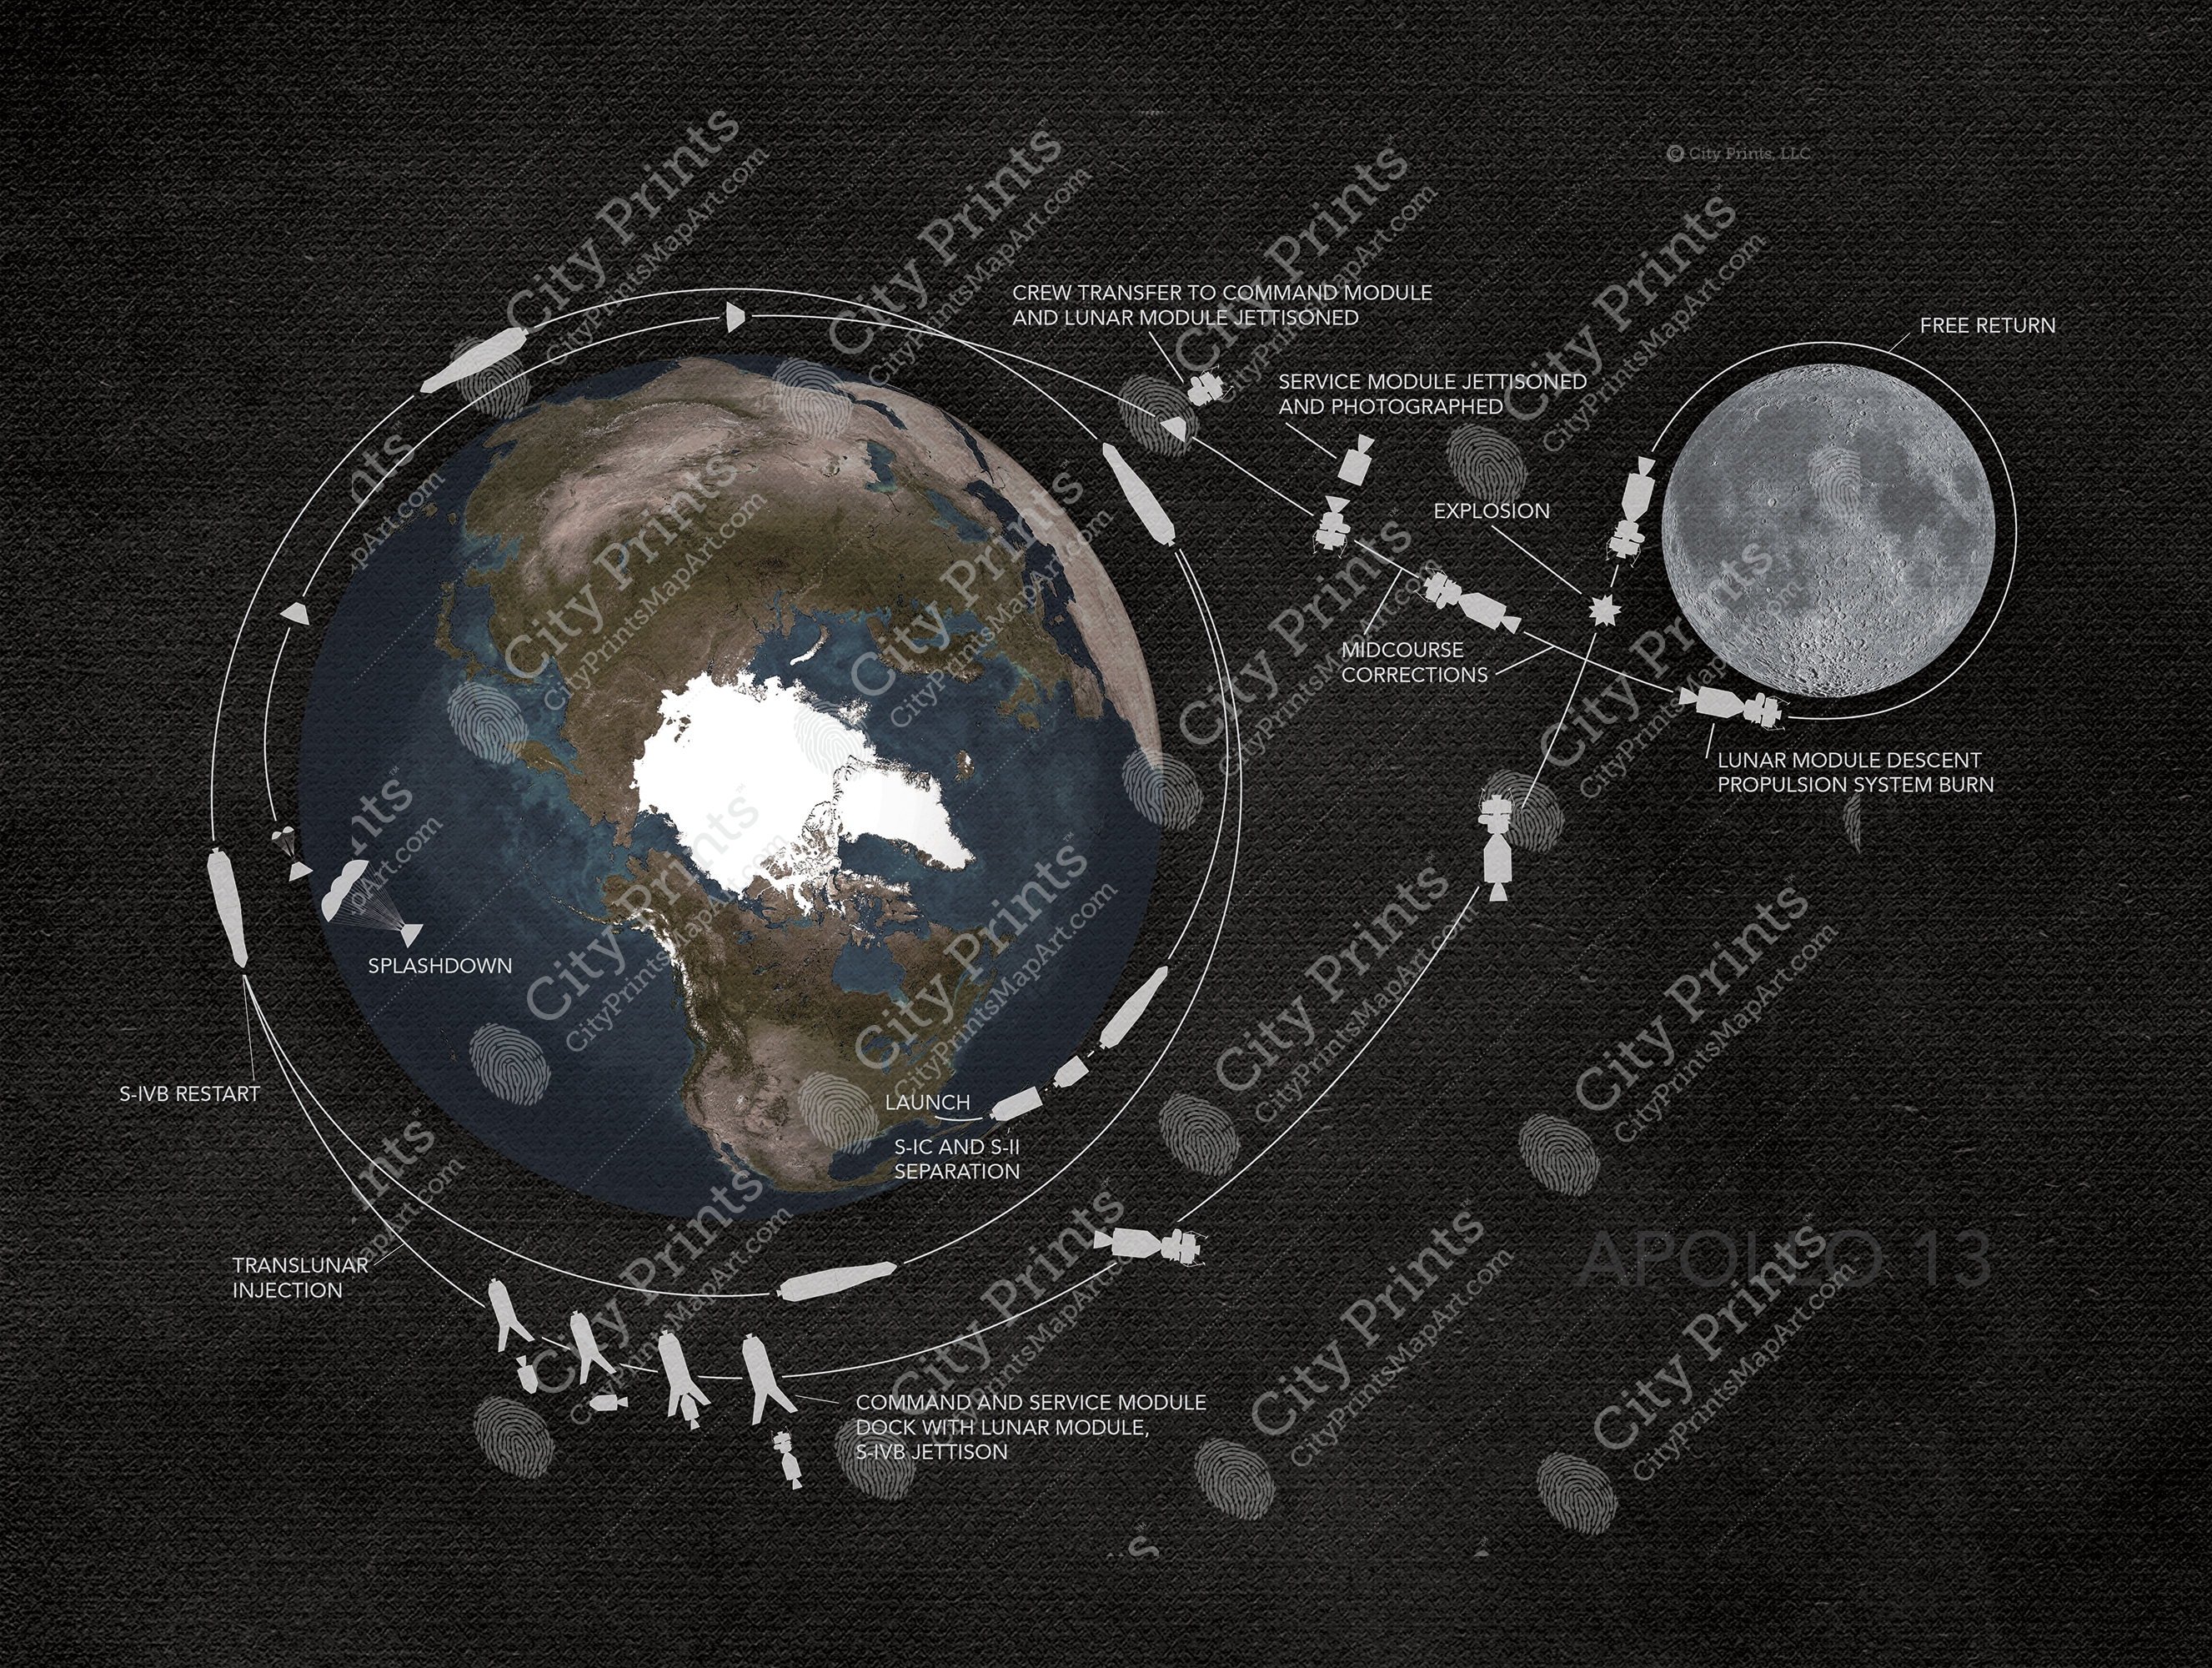 High Resolution Wallpaper | Apollo 13 2653x2000 px